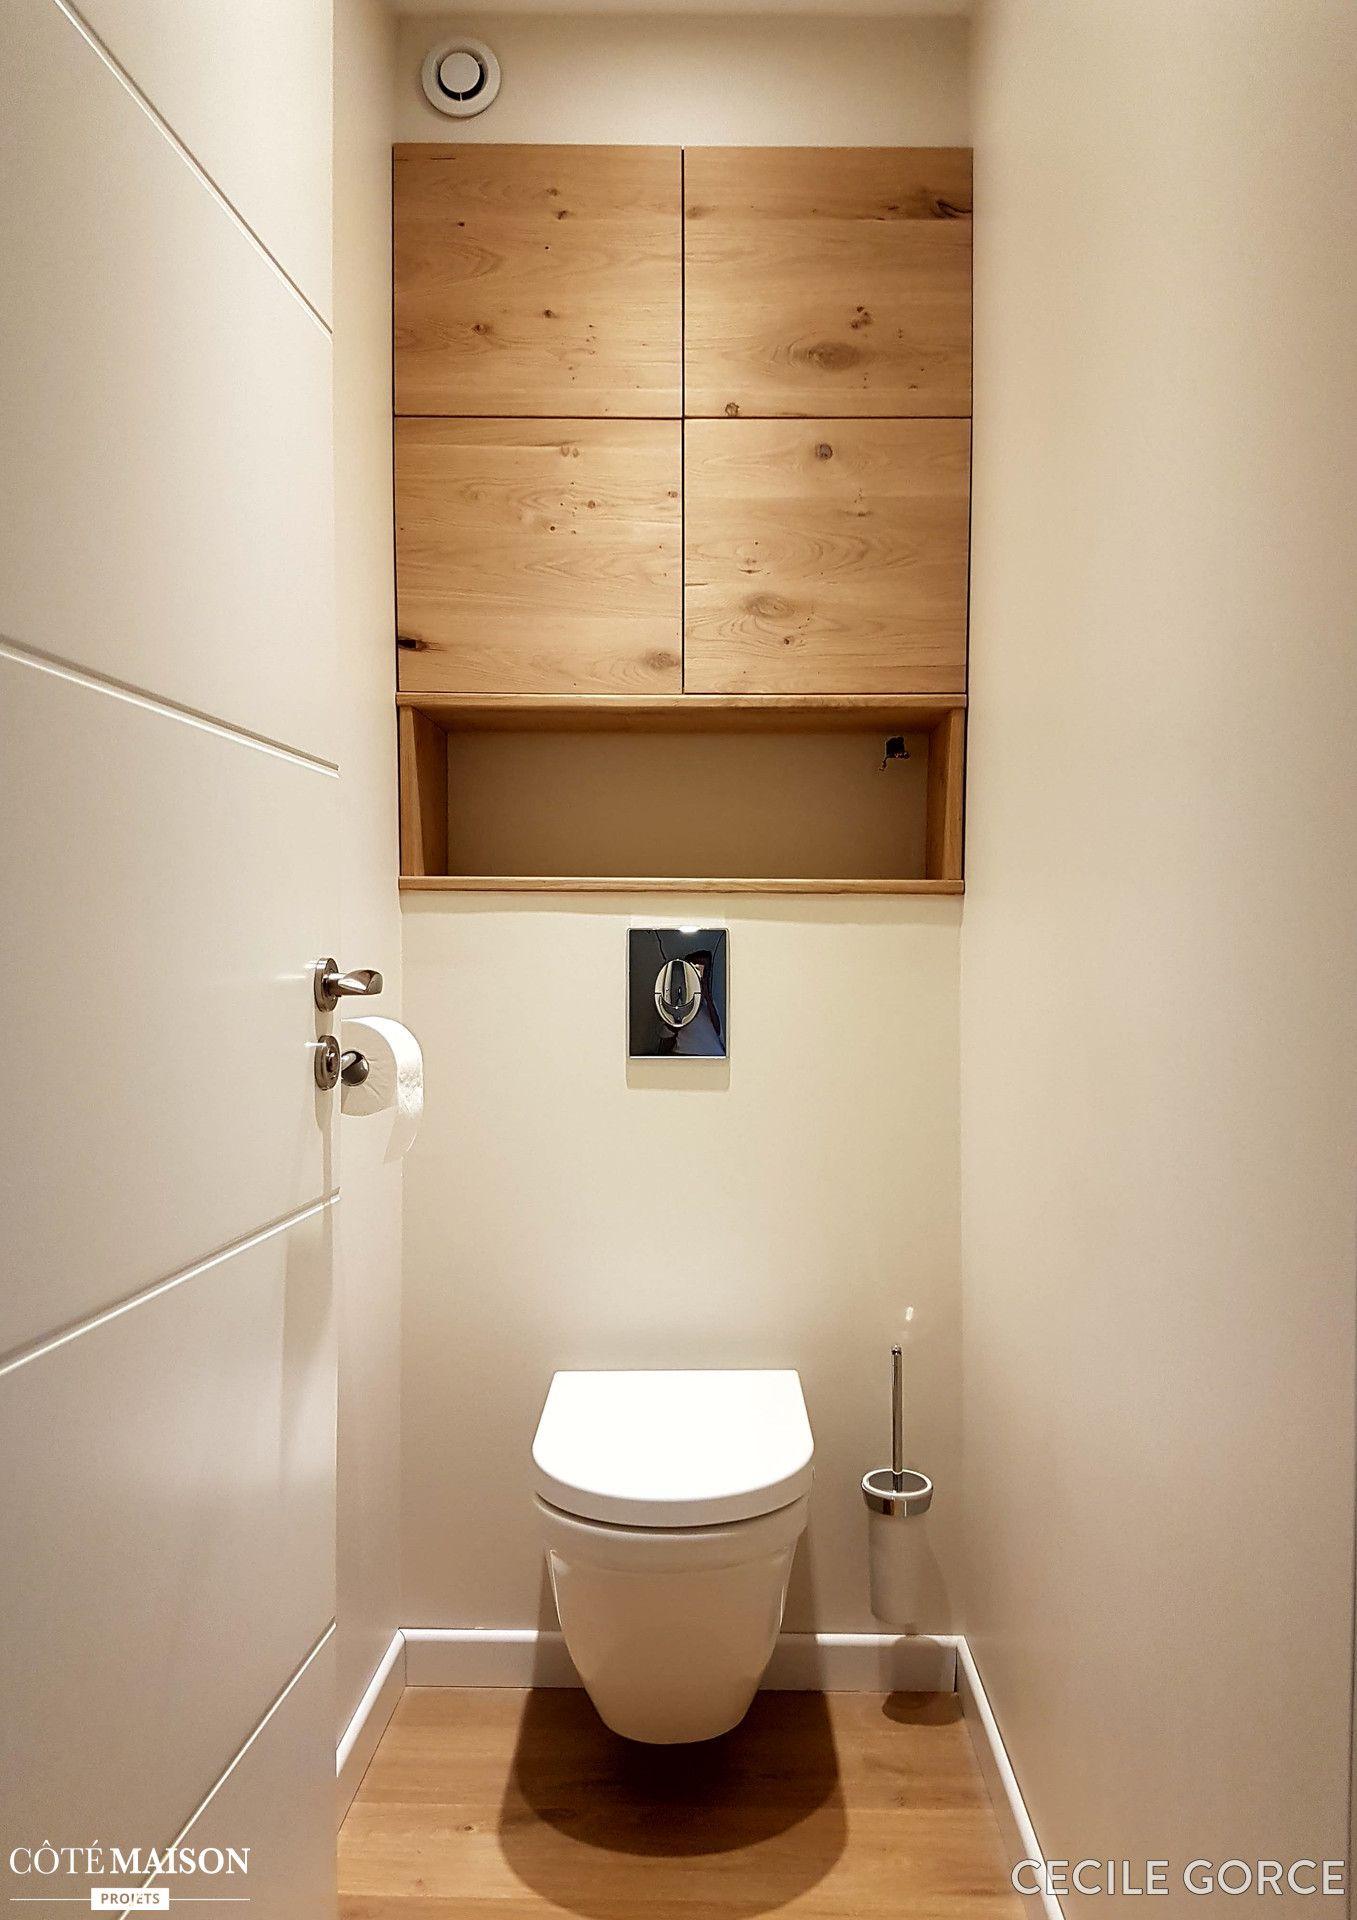 Salle De Bains Ou Toilettes ~ inspiration salle de bains inspiration salles de bains pinterest